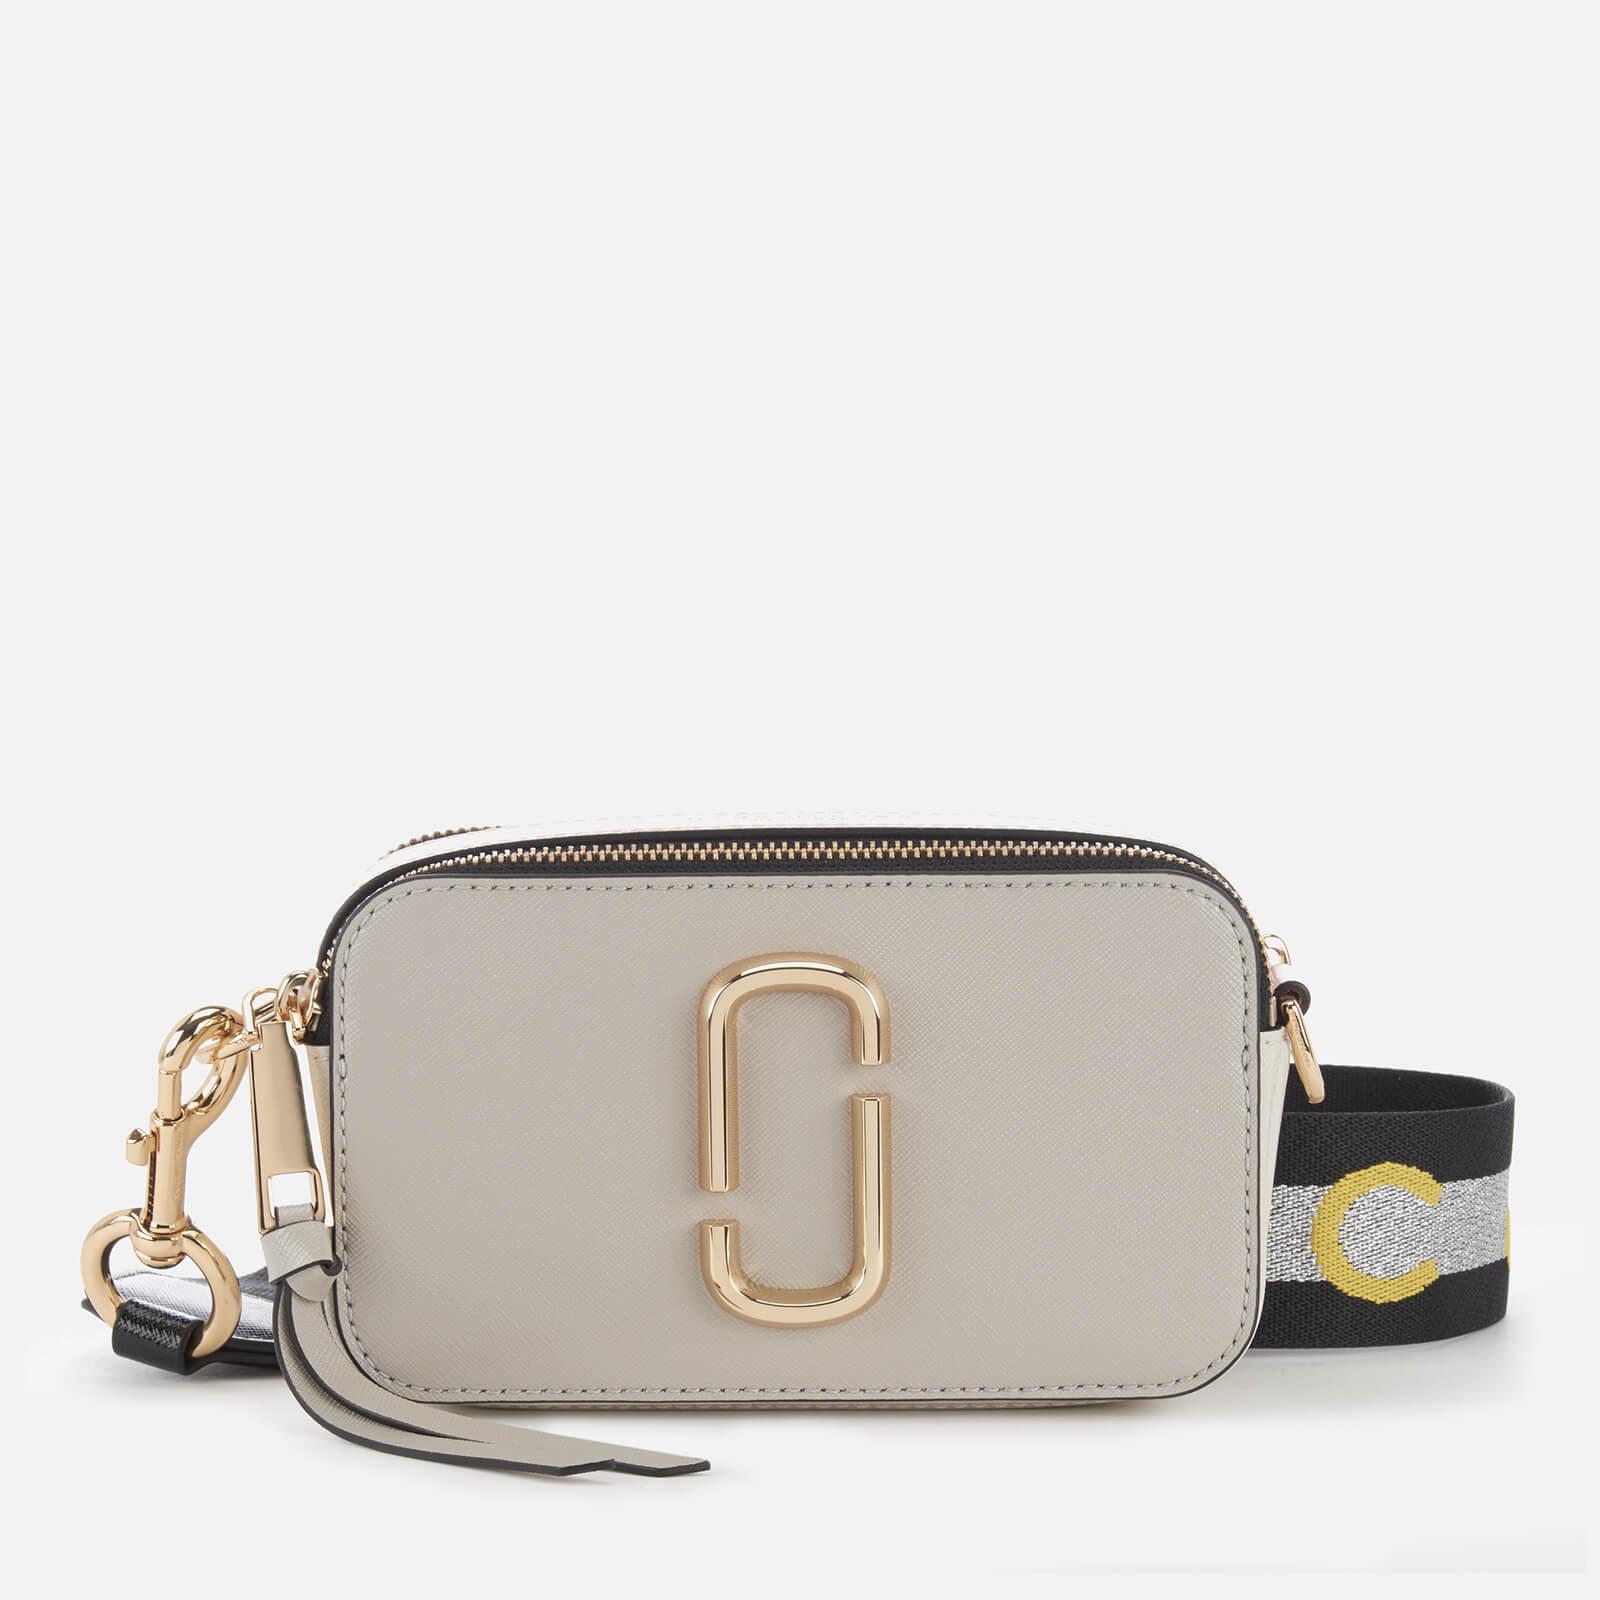 Marc Jacobs Women s Snapshot Cross Body Bag - Dust Multi - Free UK Delivery  over £50 fb5e4c8843567